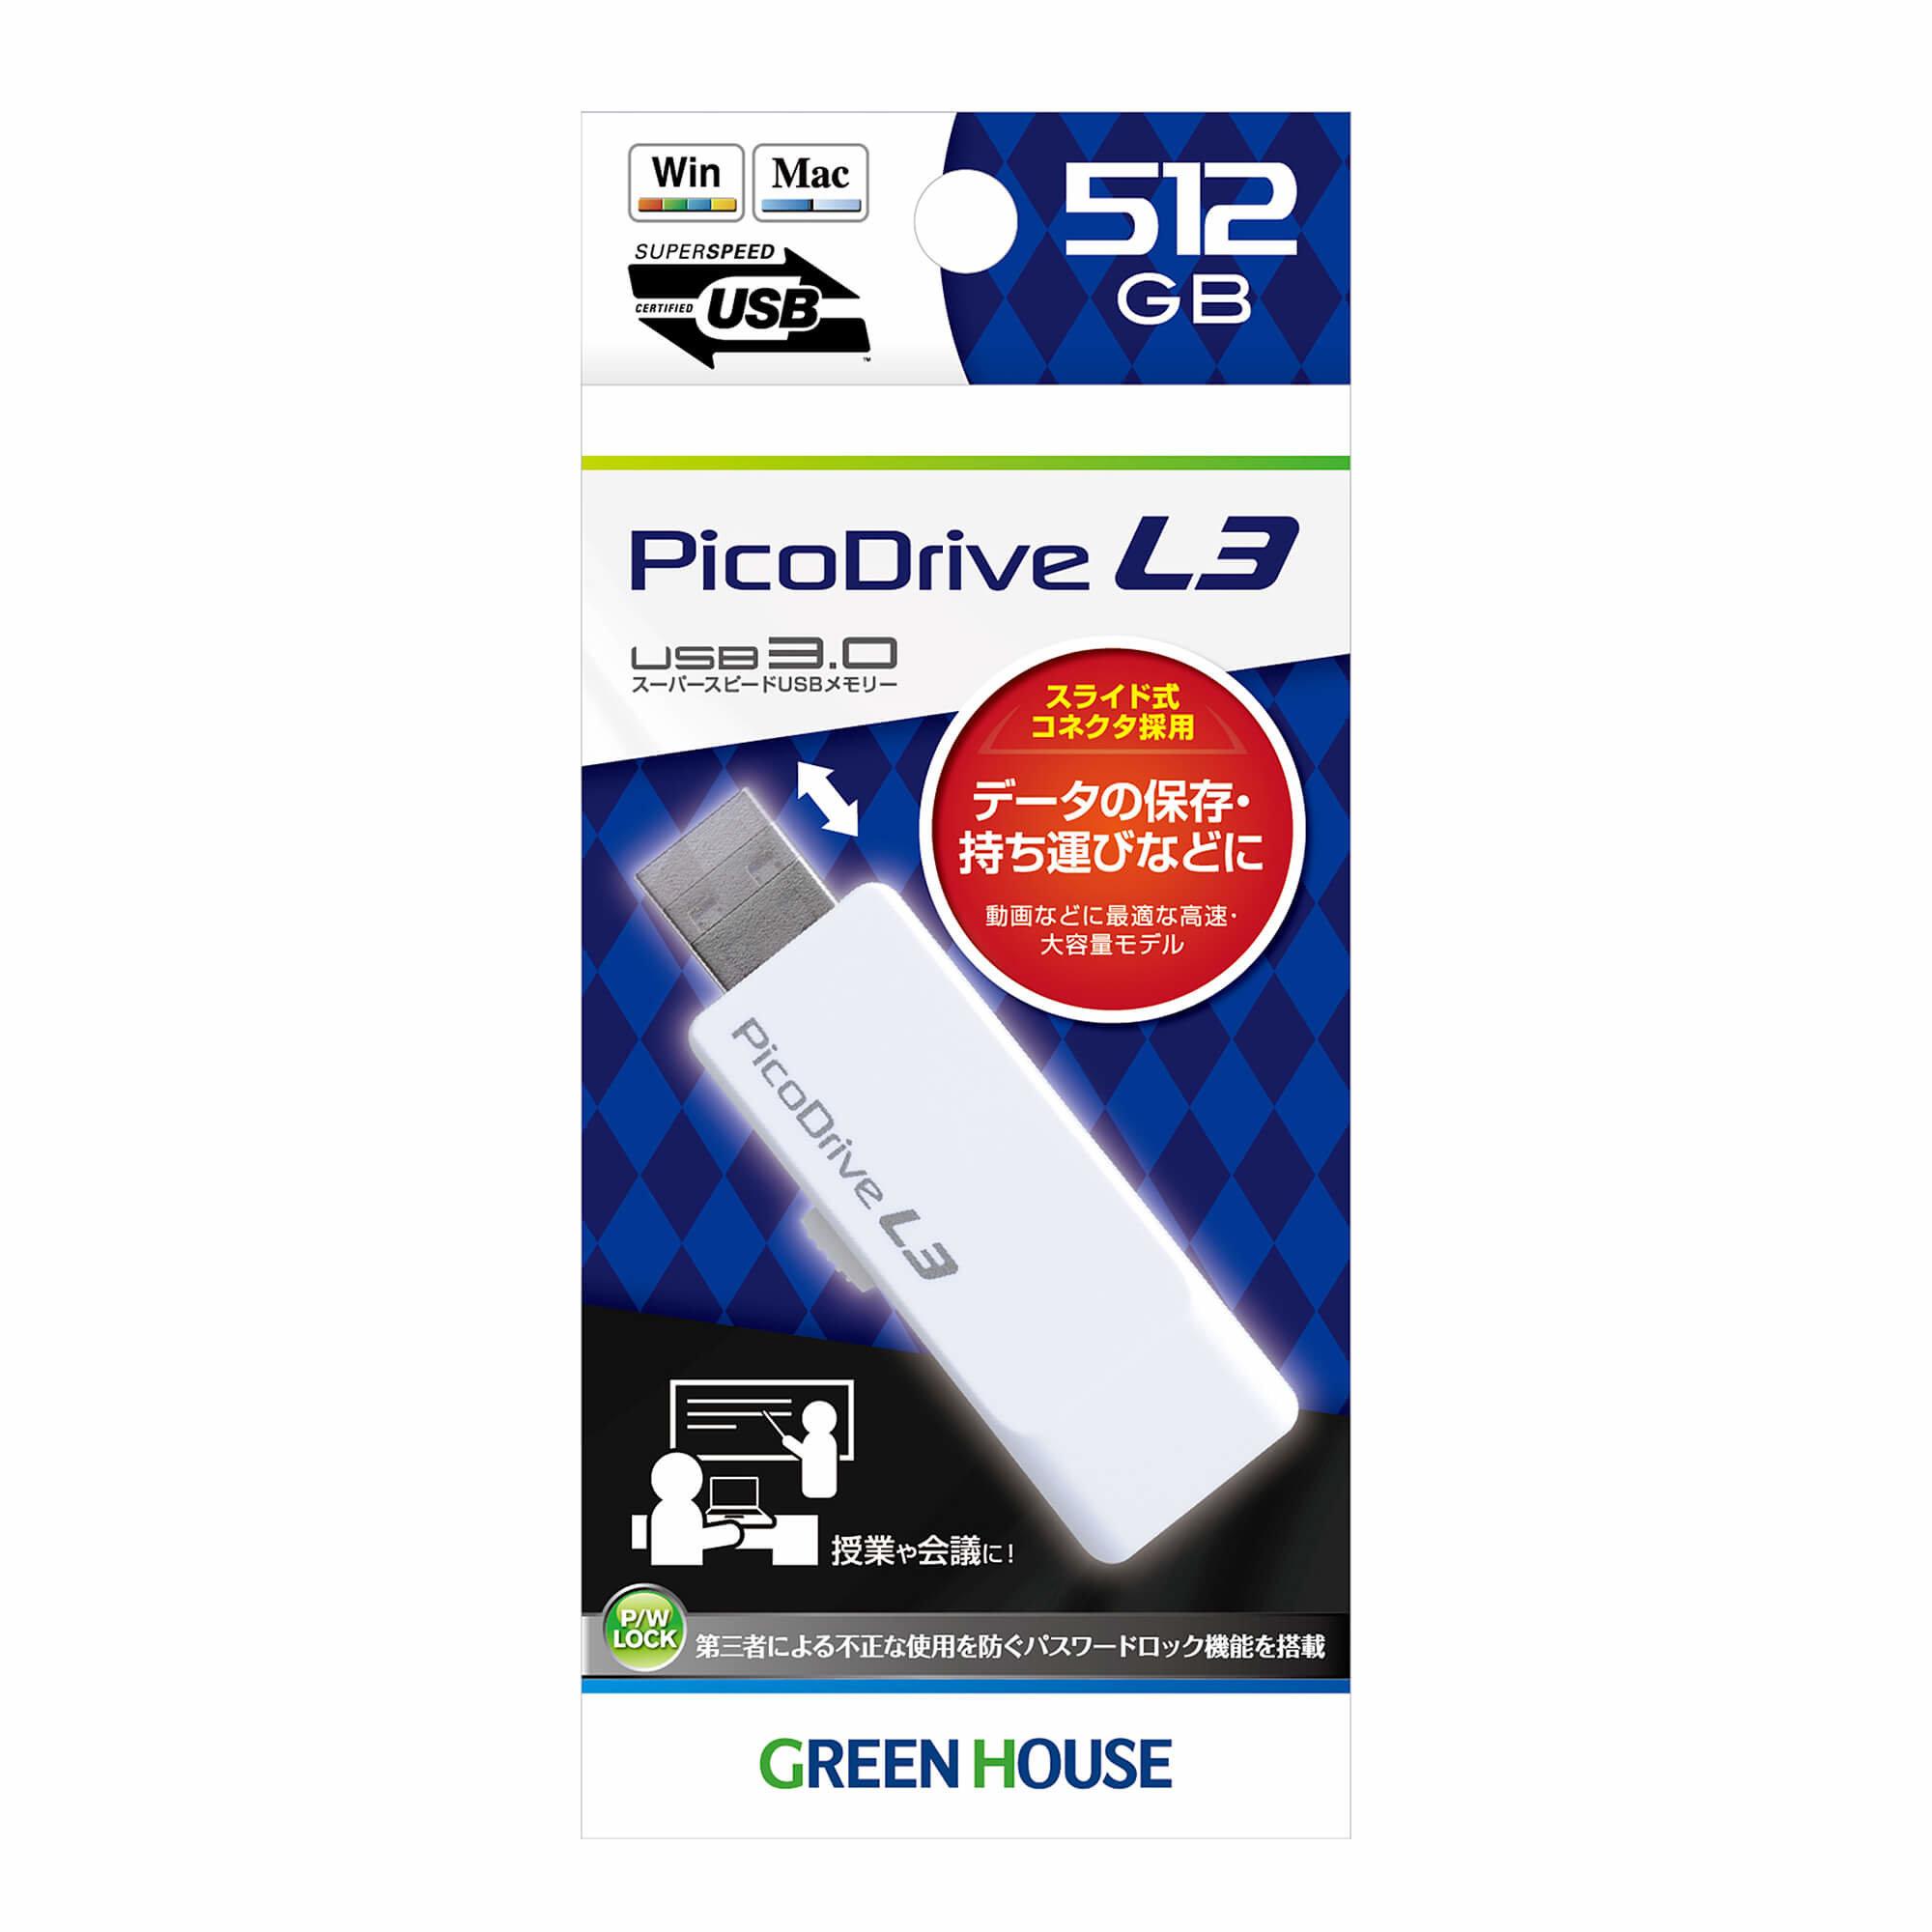 GREENHOUSE PicoDrive L3 512.jpg